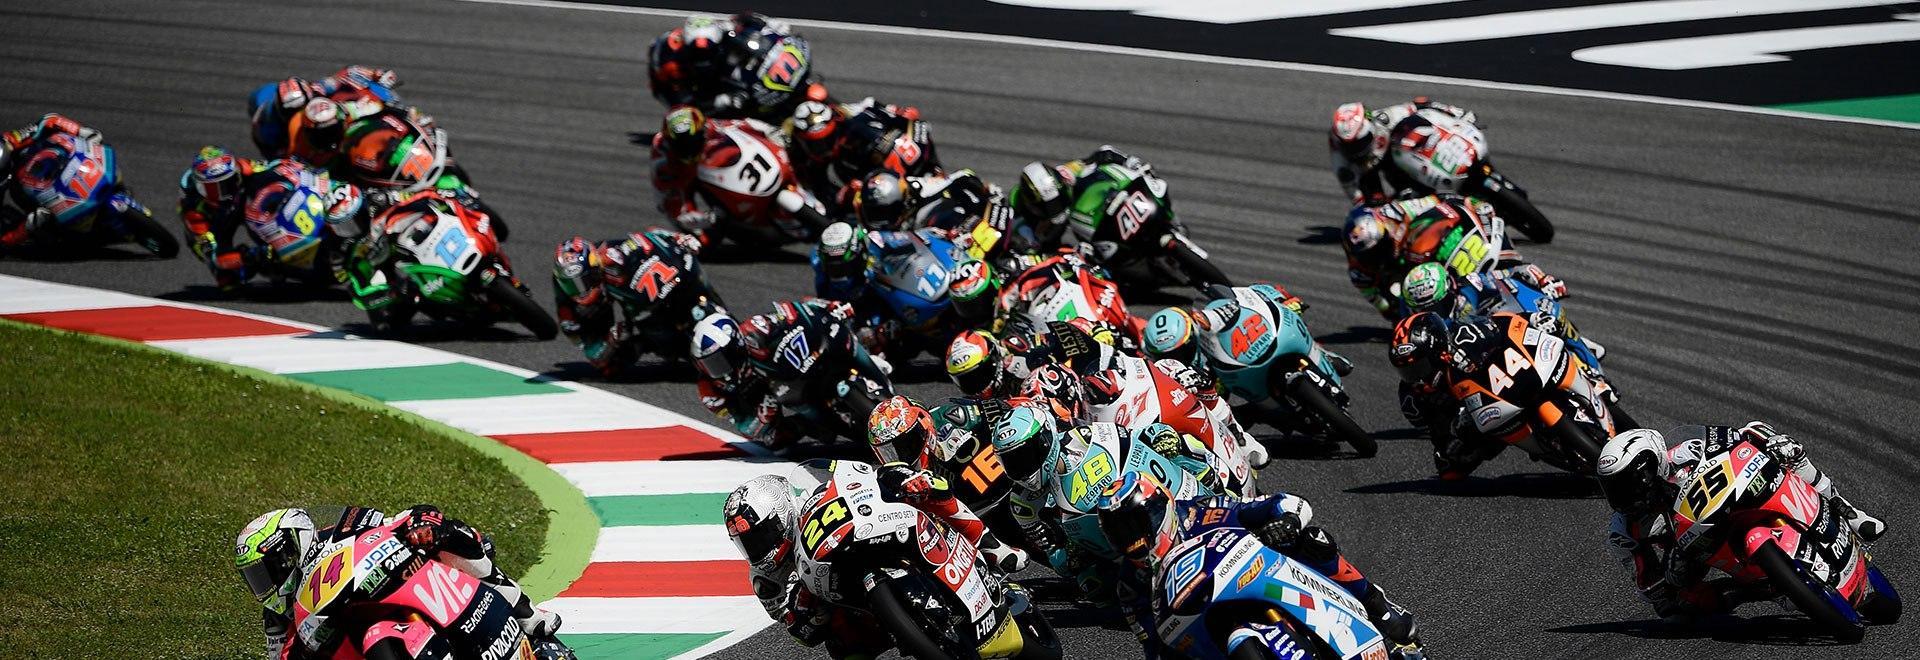 Moto3 Imola. Race 1